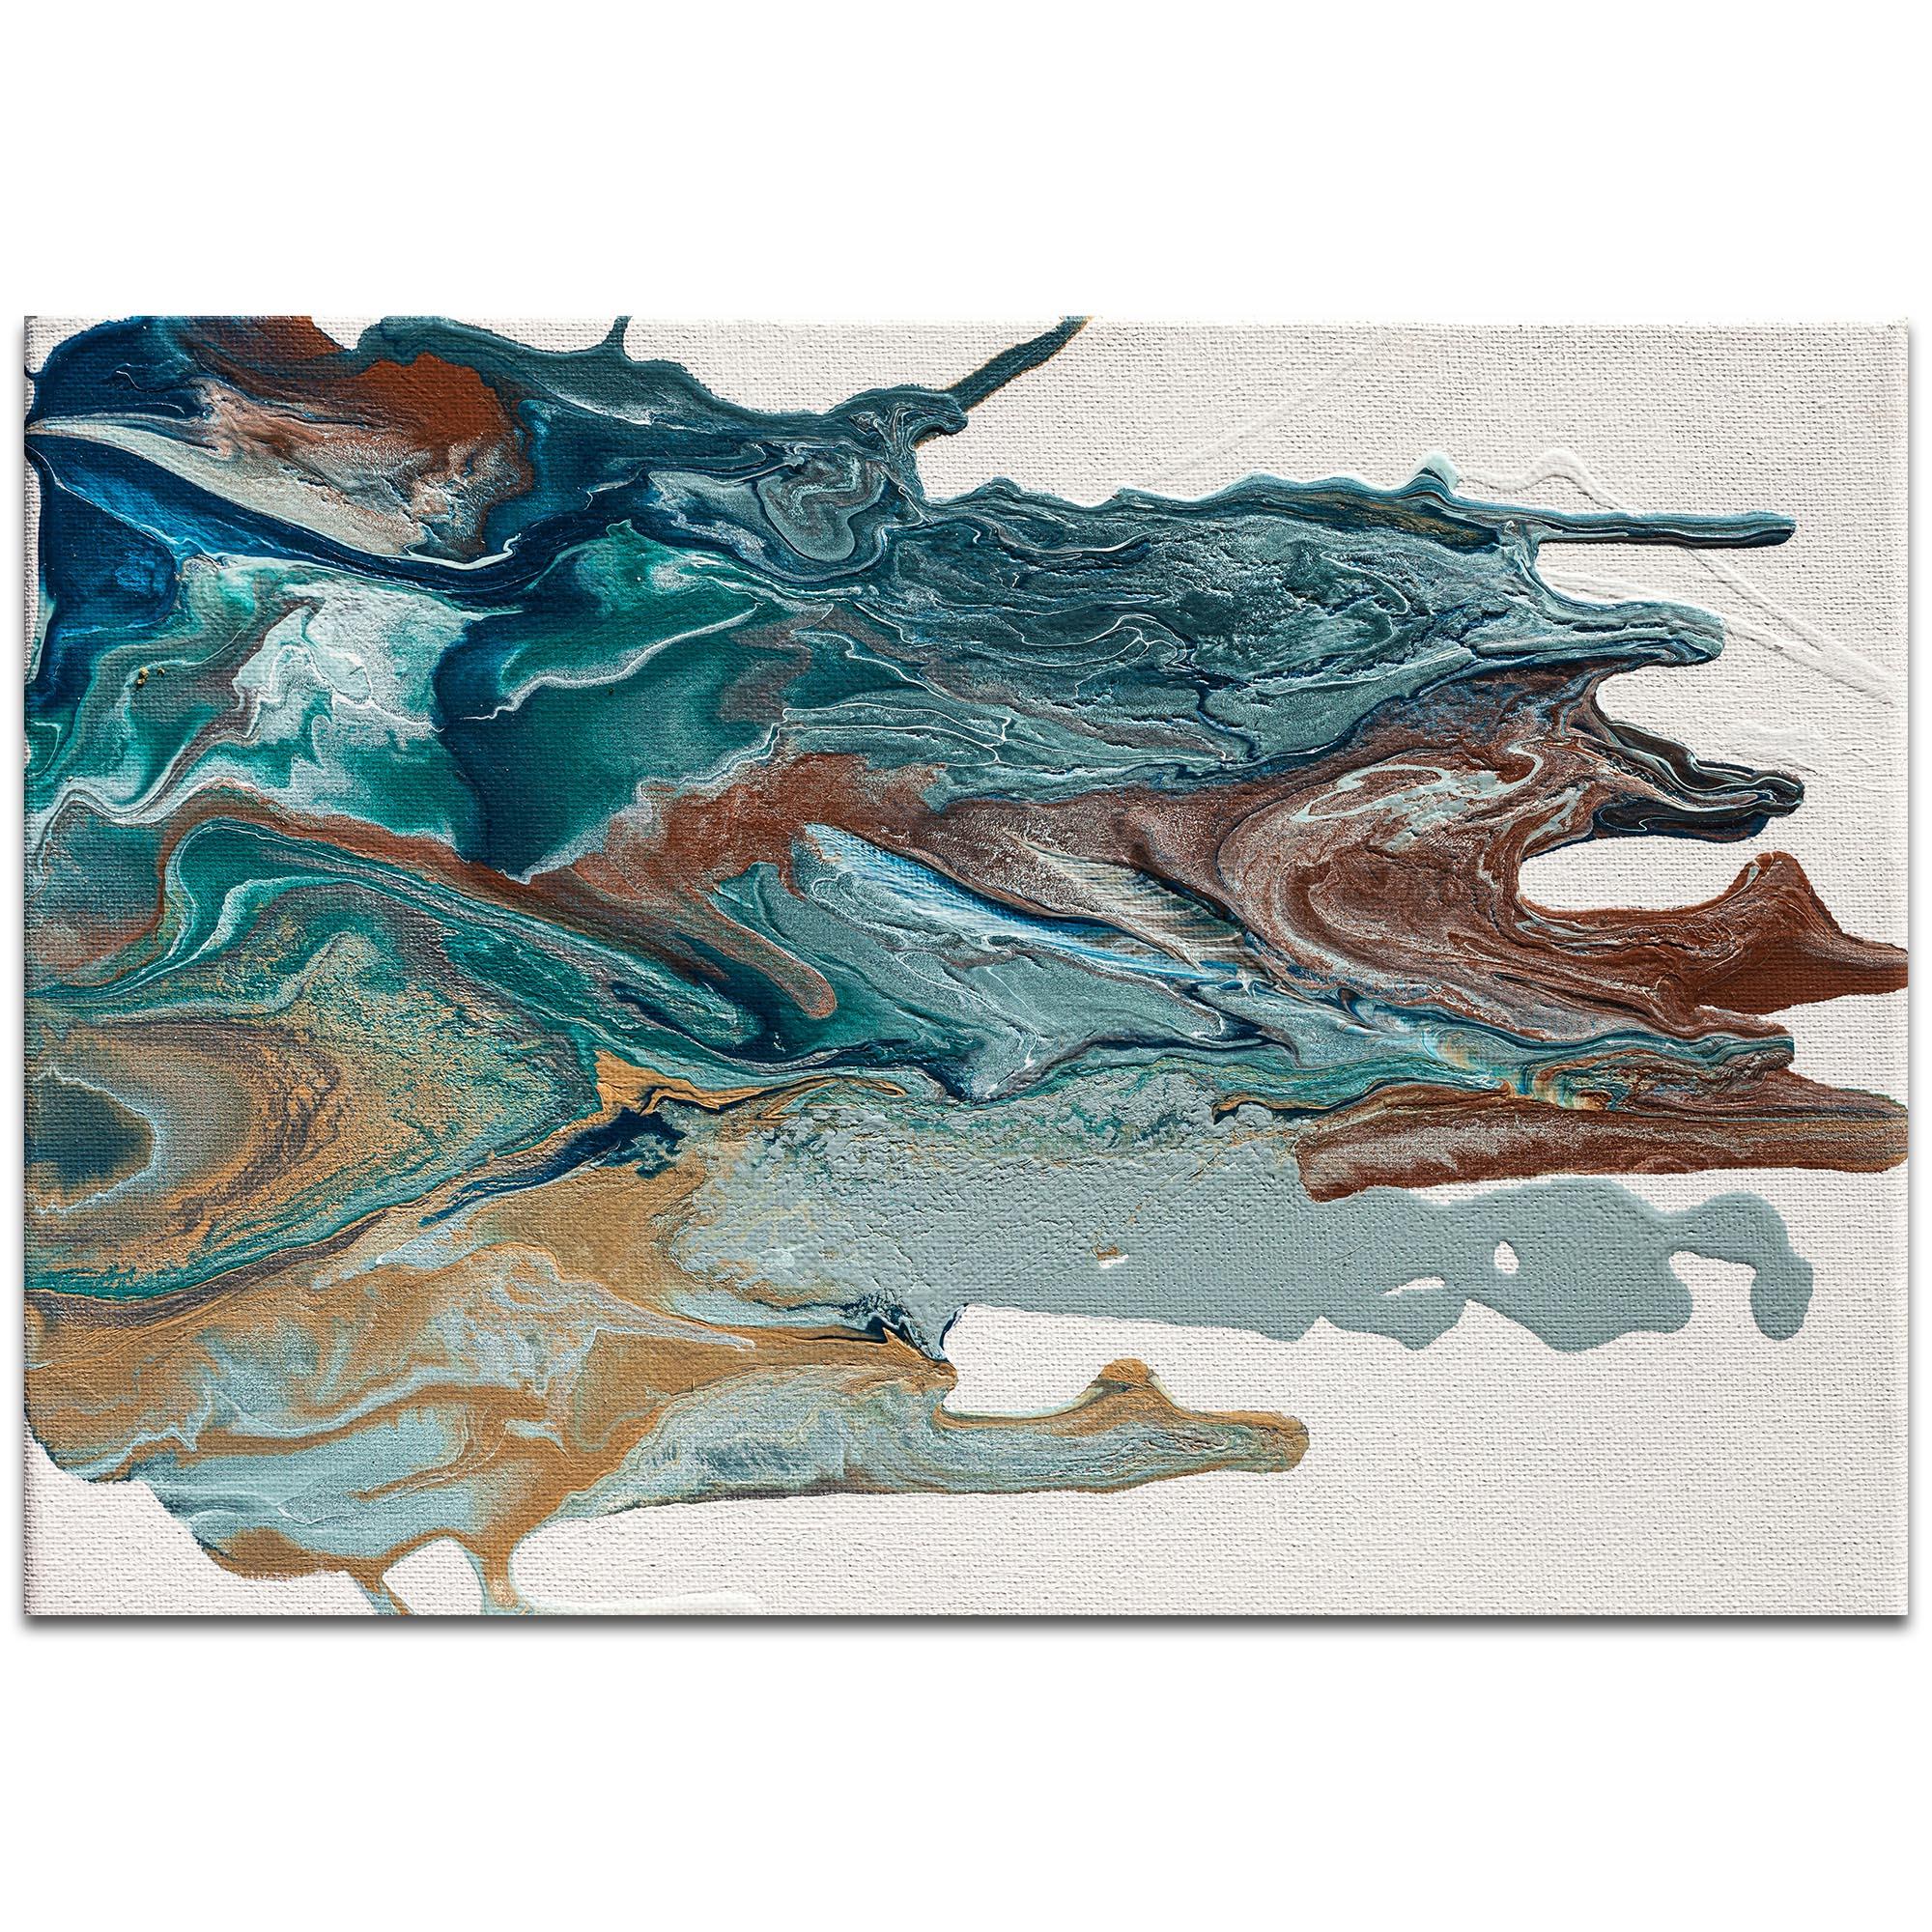 Abstract Wall Art 'Earth 1' - Urban Splatter Decor on Metal or Plexiglass